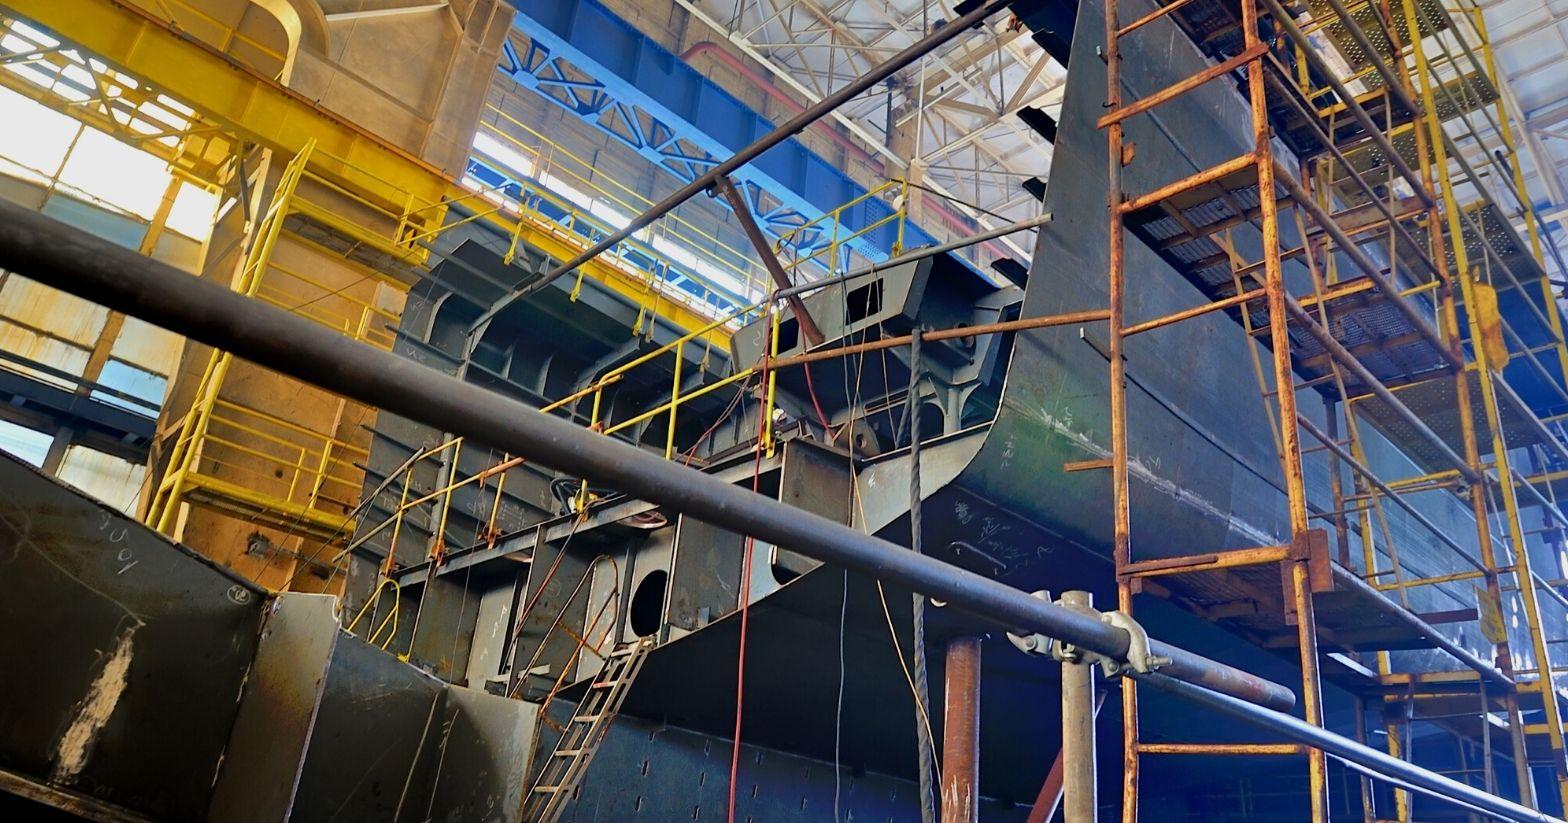 shipyard scaffolding